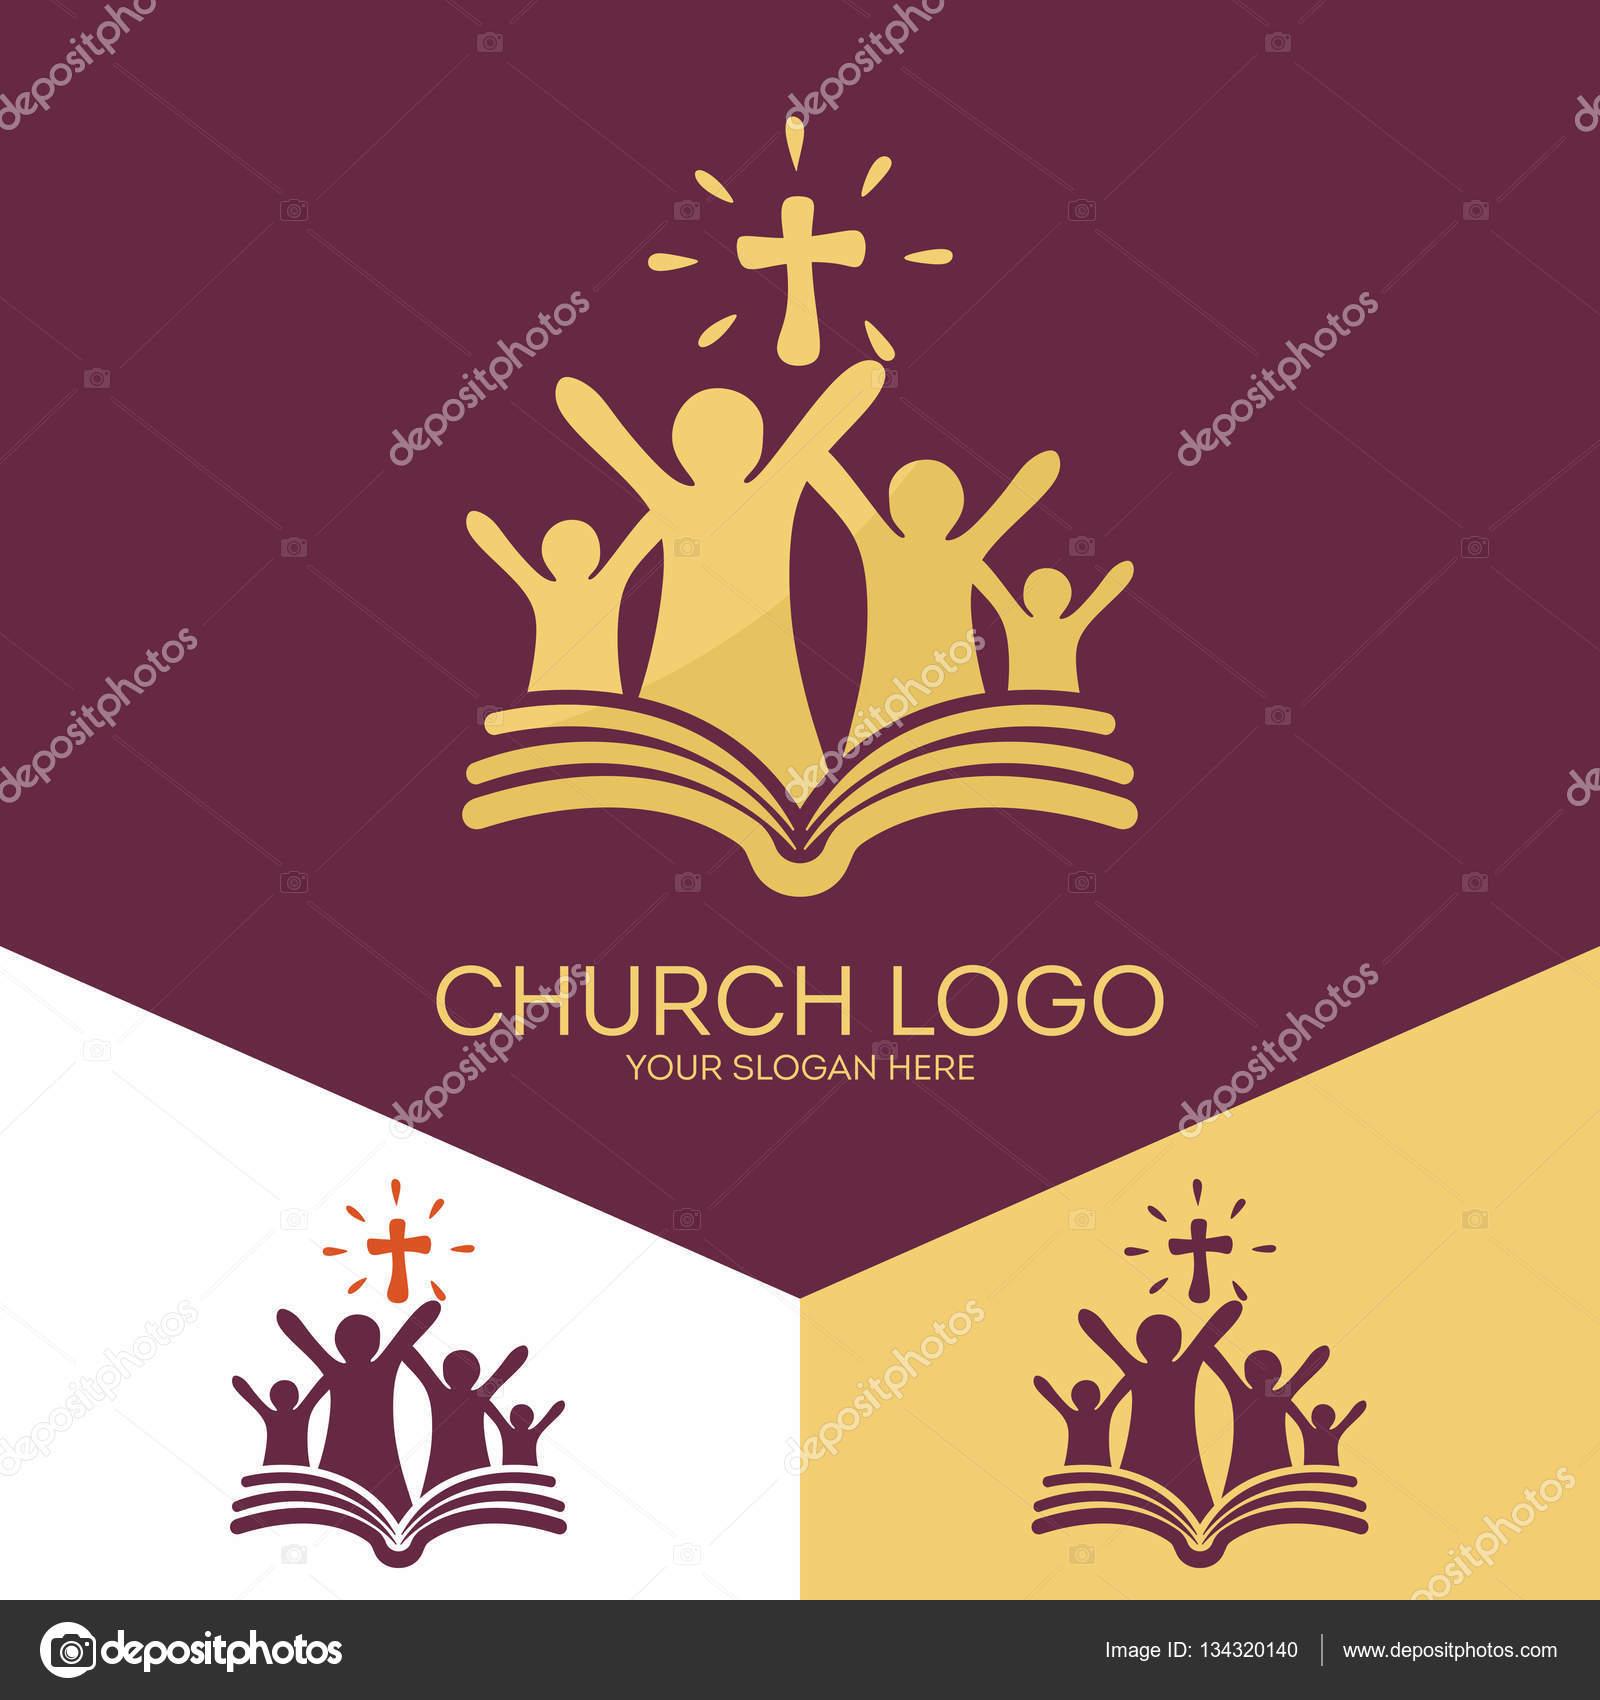 Church Logo Christian Symbols Church Of God Faithful To The Lord